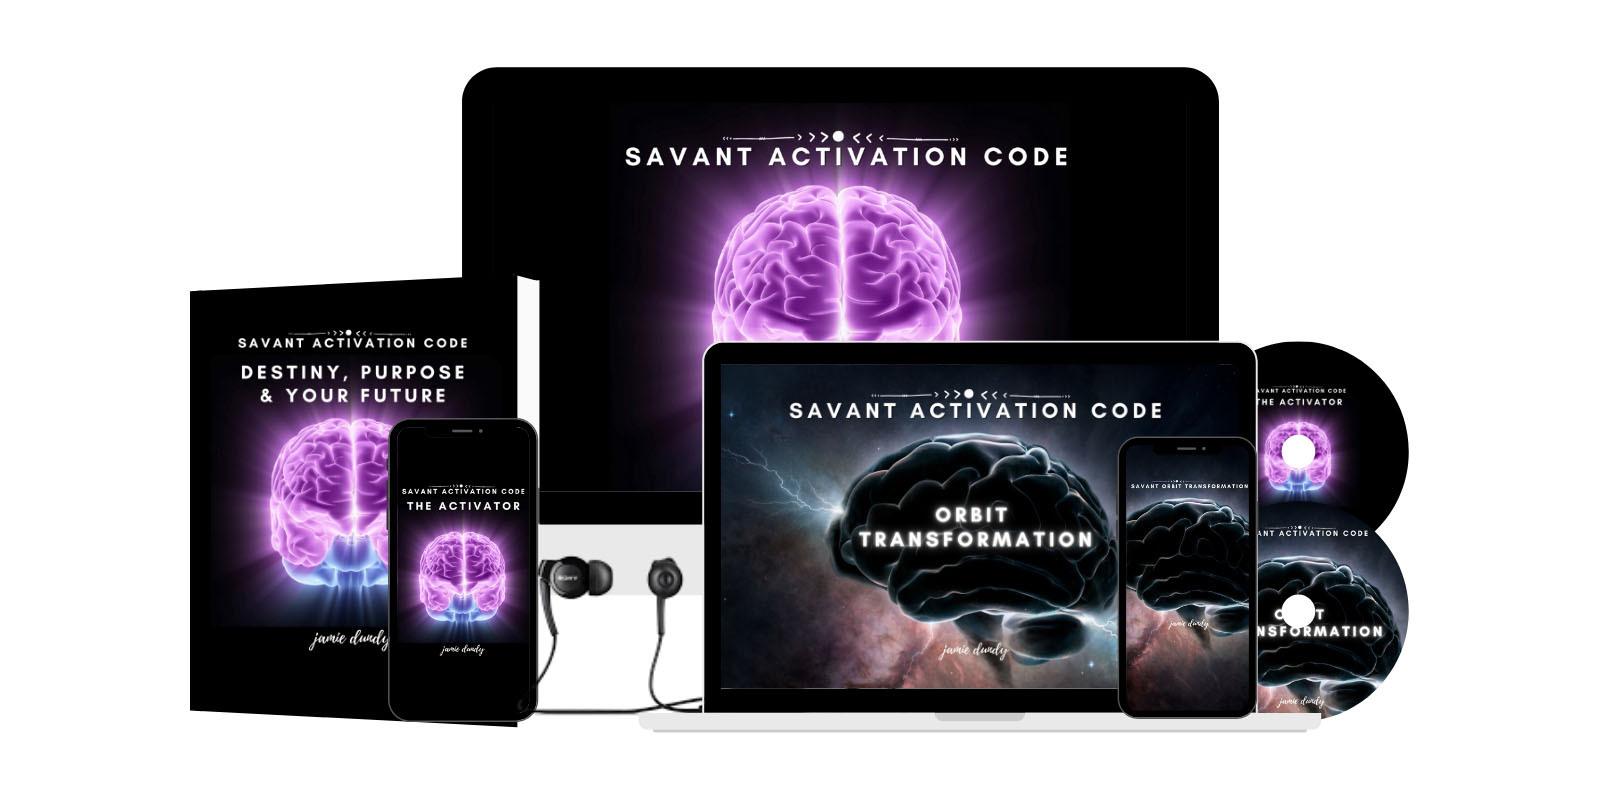 The Savant Activation Code Reviews